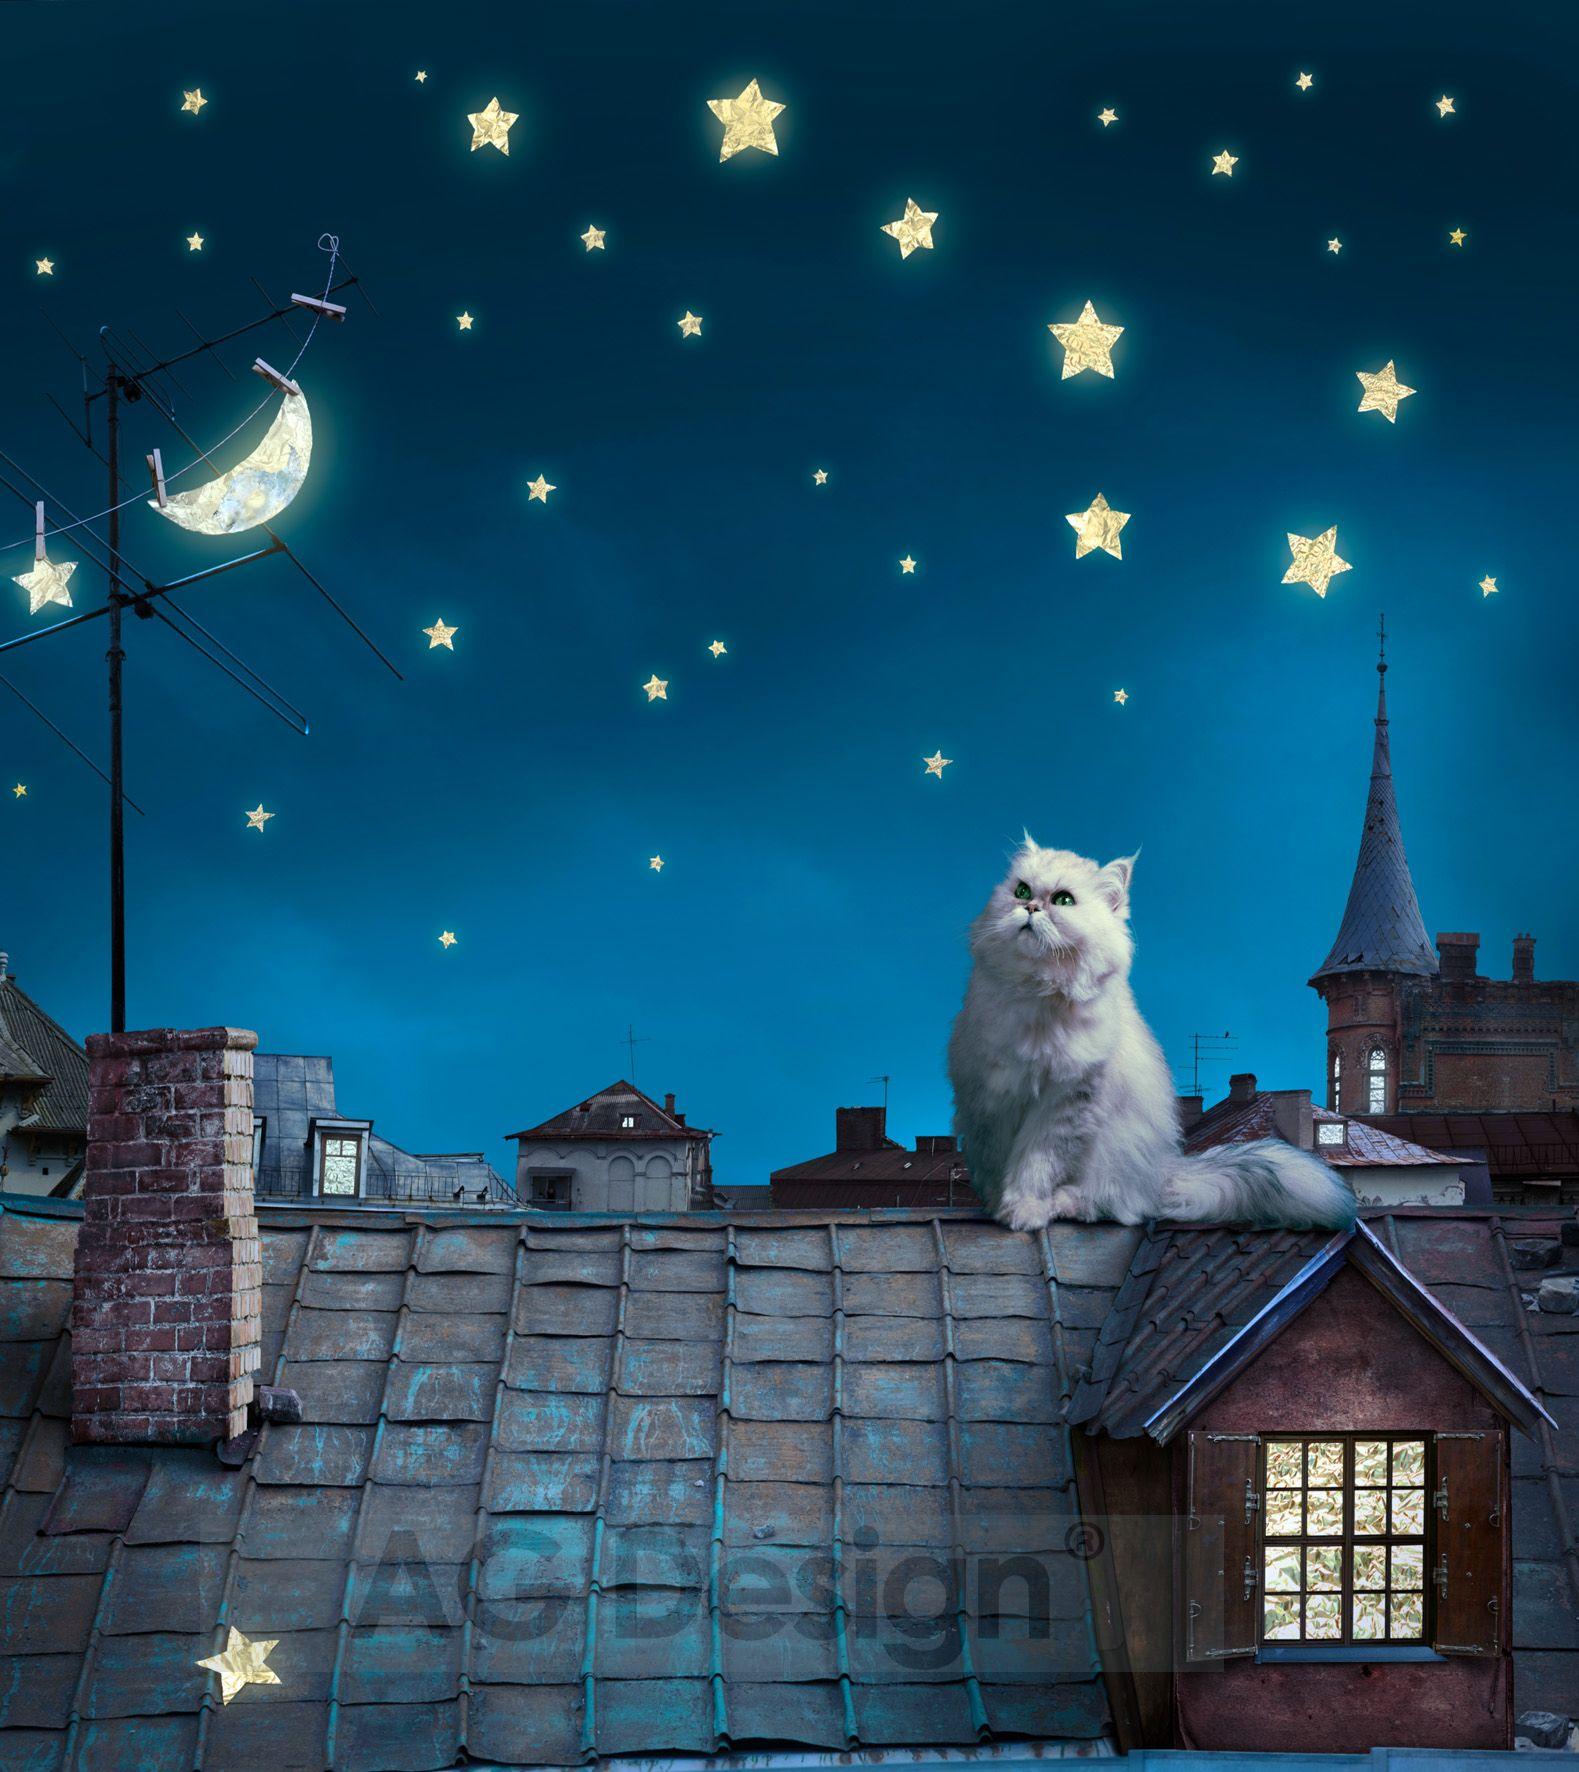 Fototapeta dvoudílná - kočka na střeše